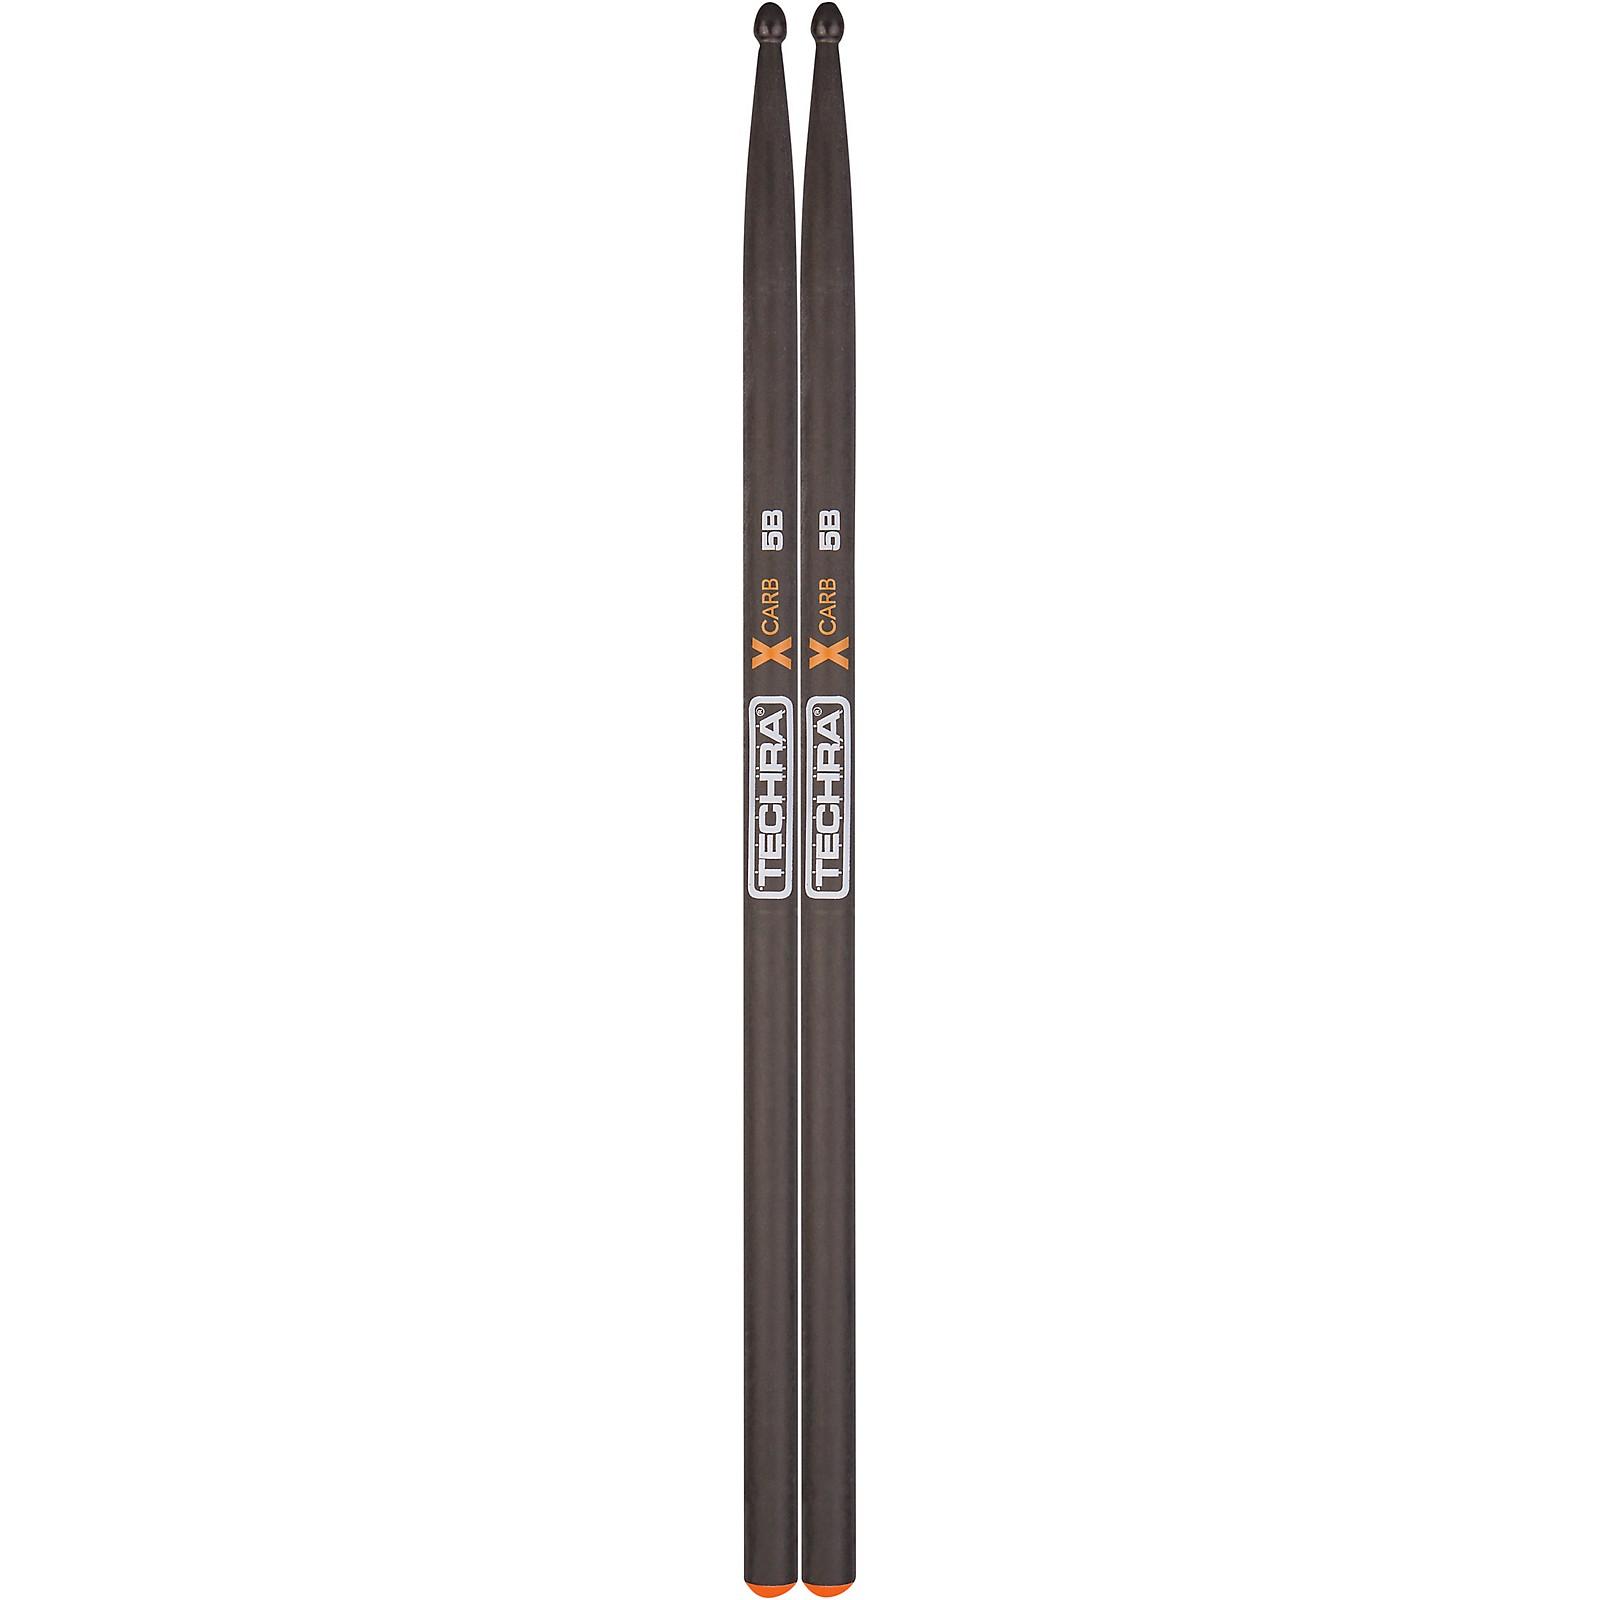 TECHRA X-CARB Carbon Fiber Drum Sticks